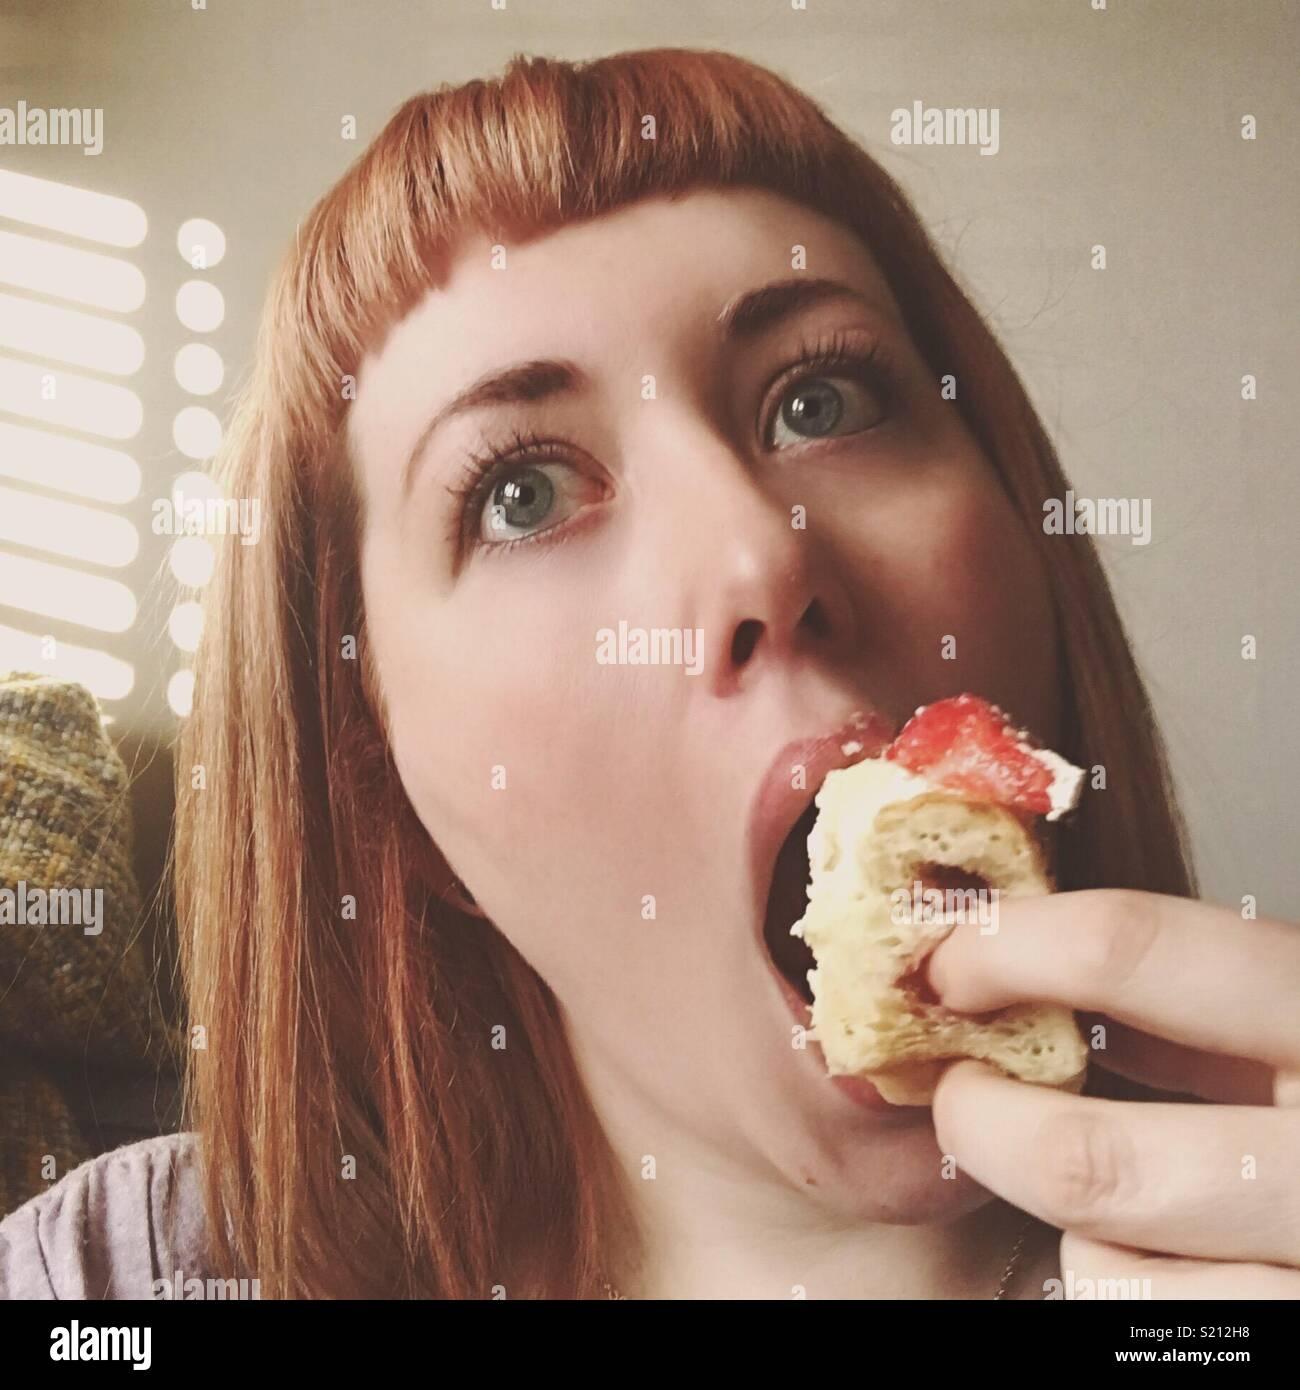 Eat Me Immagini Stock